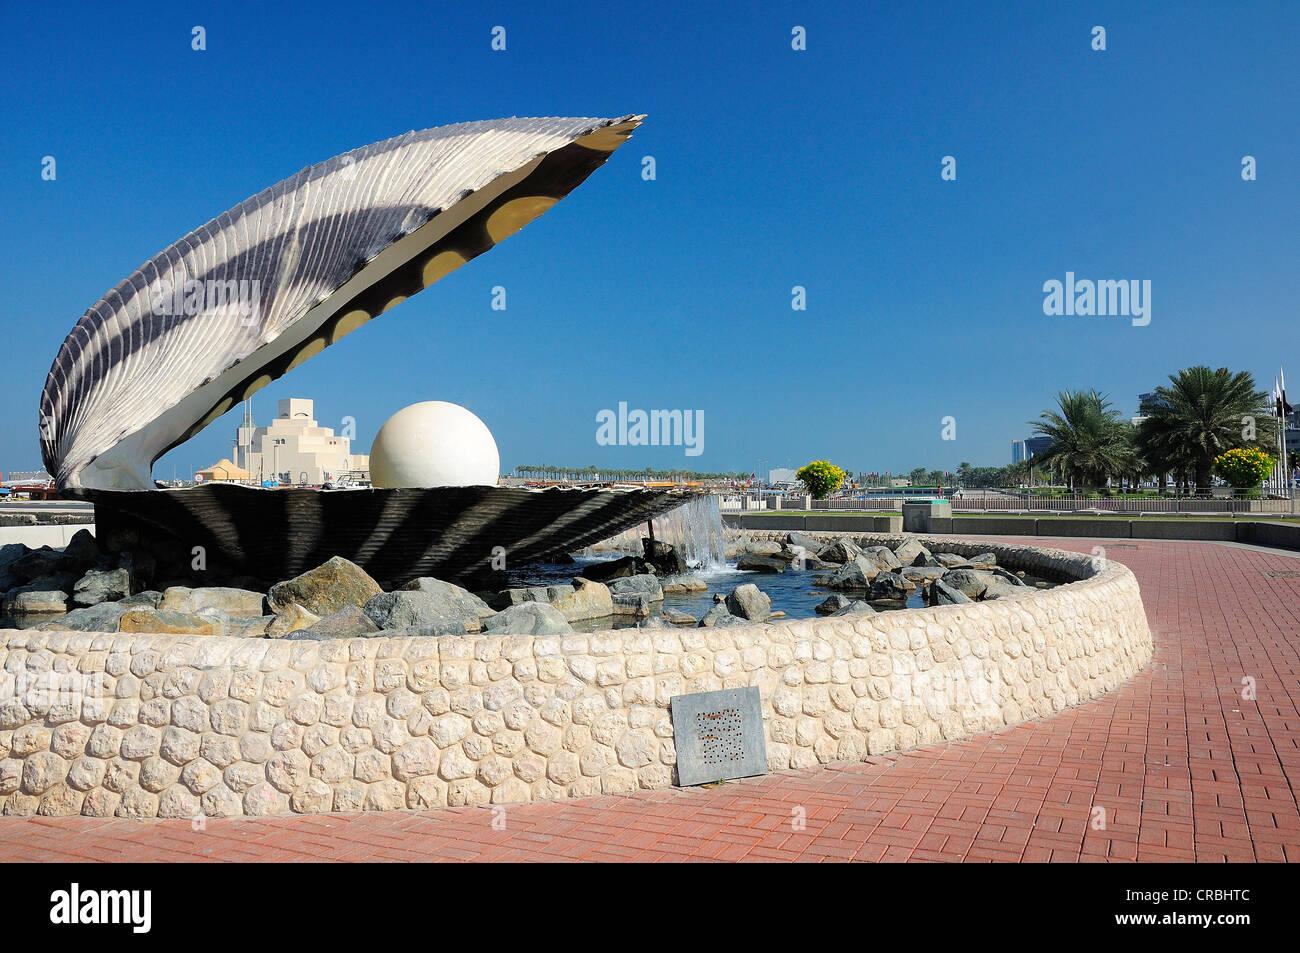 Ostra perla y fuente, Corniche, Doha, Qatar, Oriente Medio Imagen De Stock